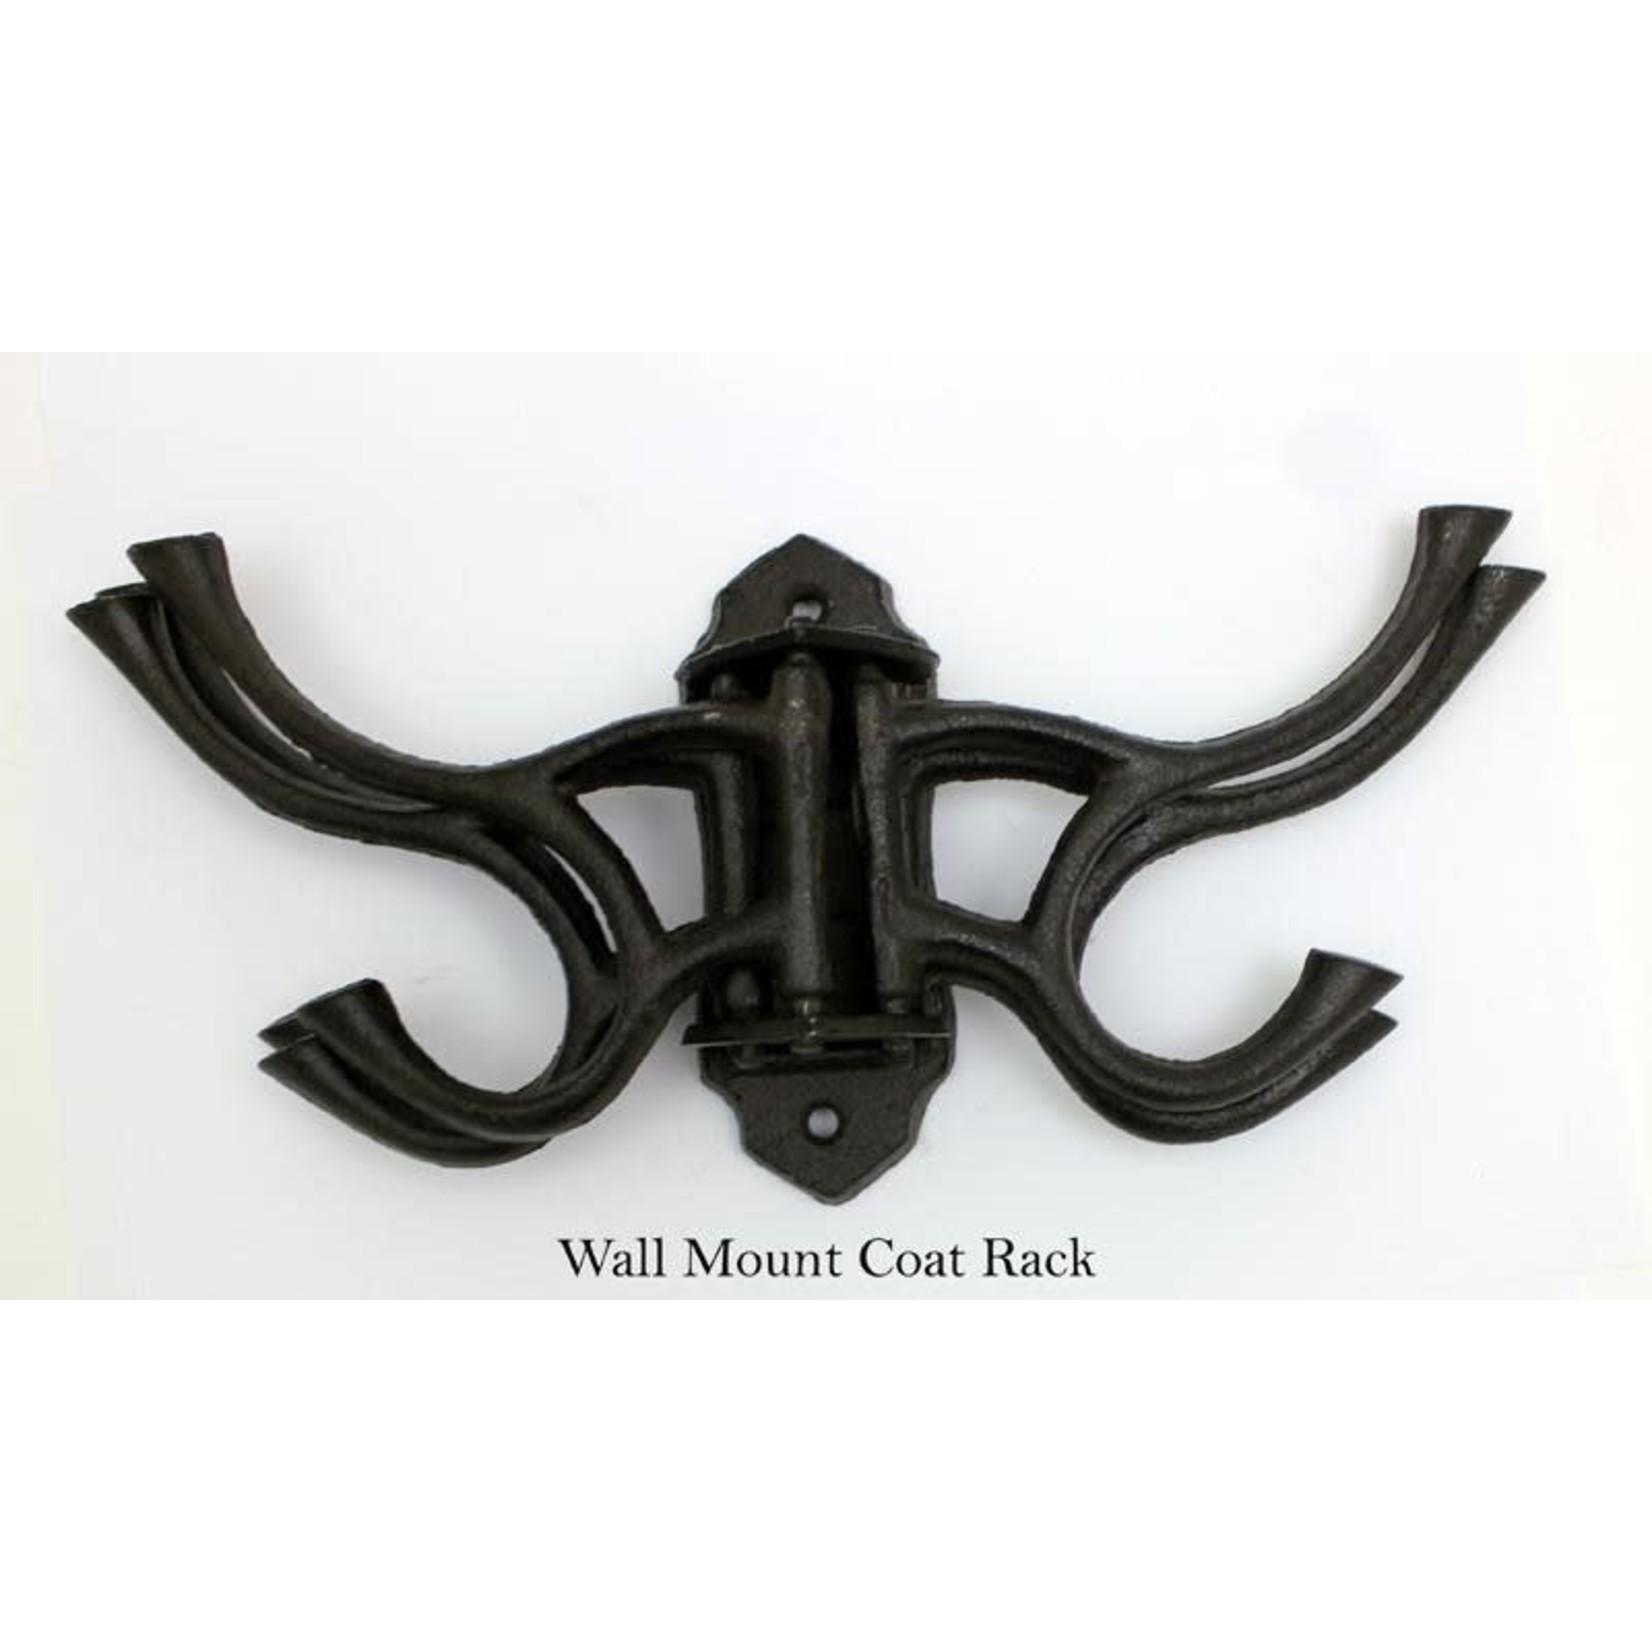 Cast Iron Coat Rack